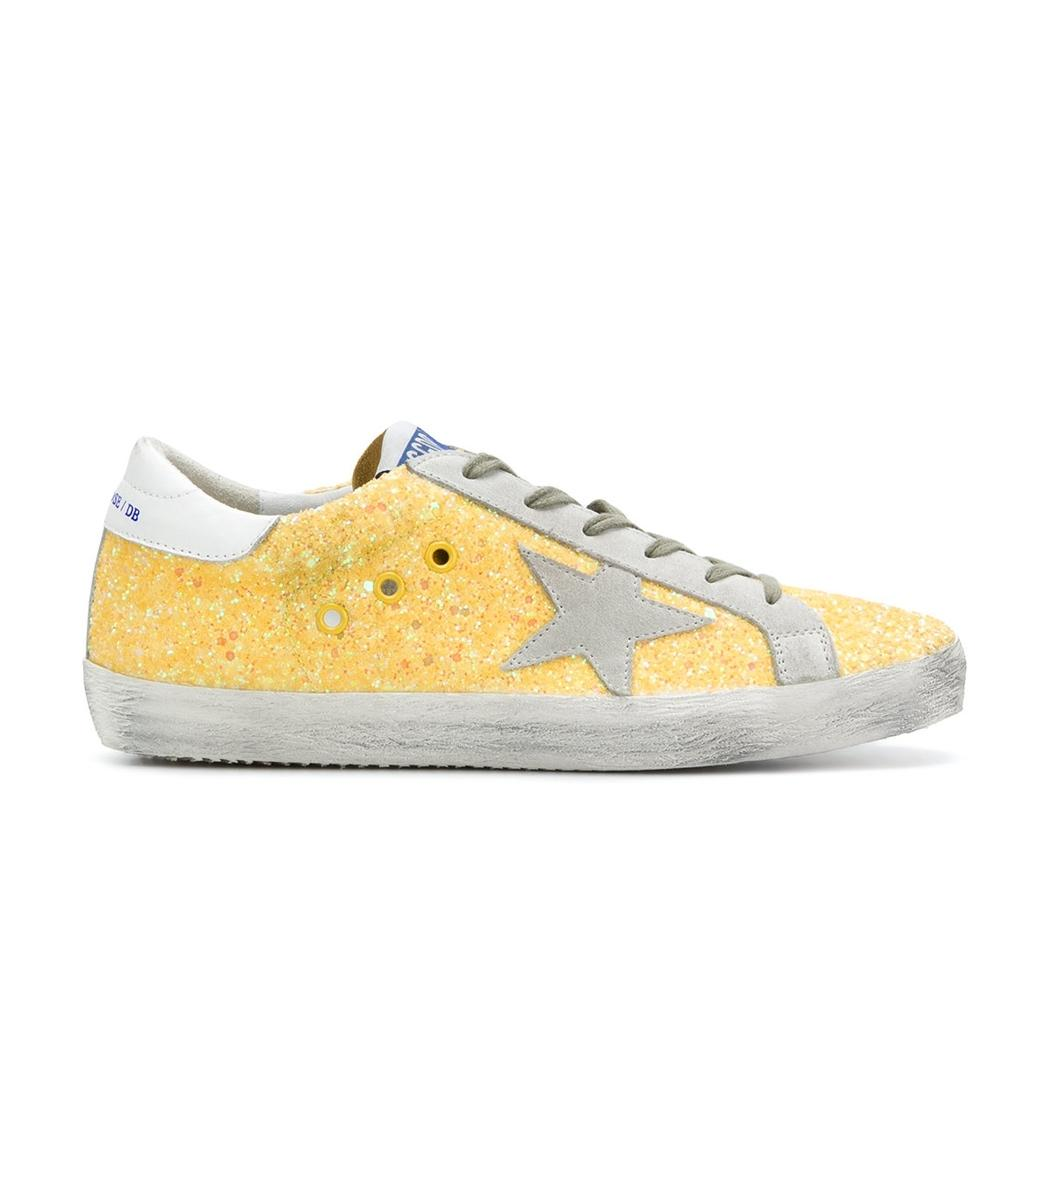 Golden Goose Yellow Glitter Superstar Sneaker